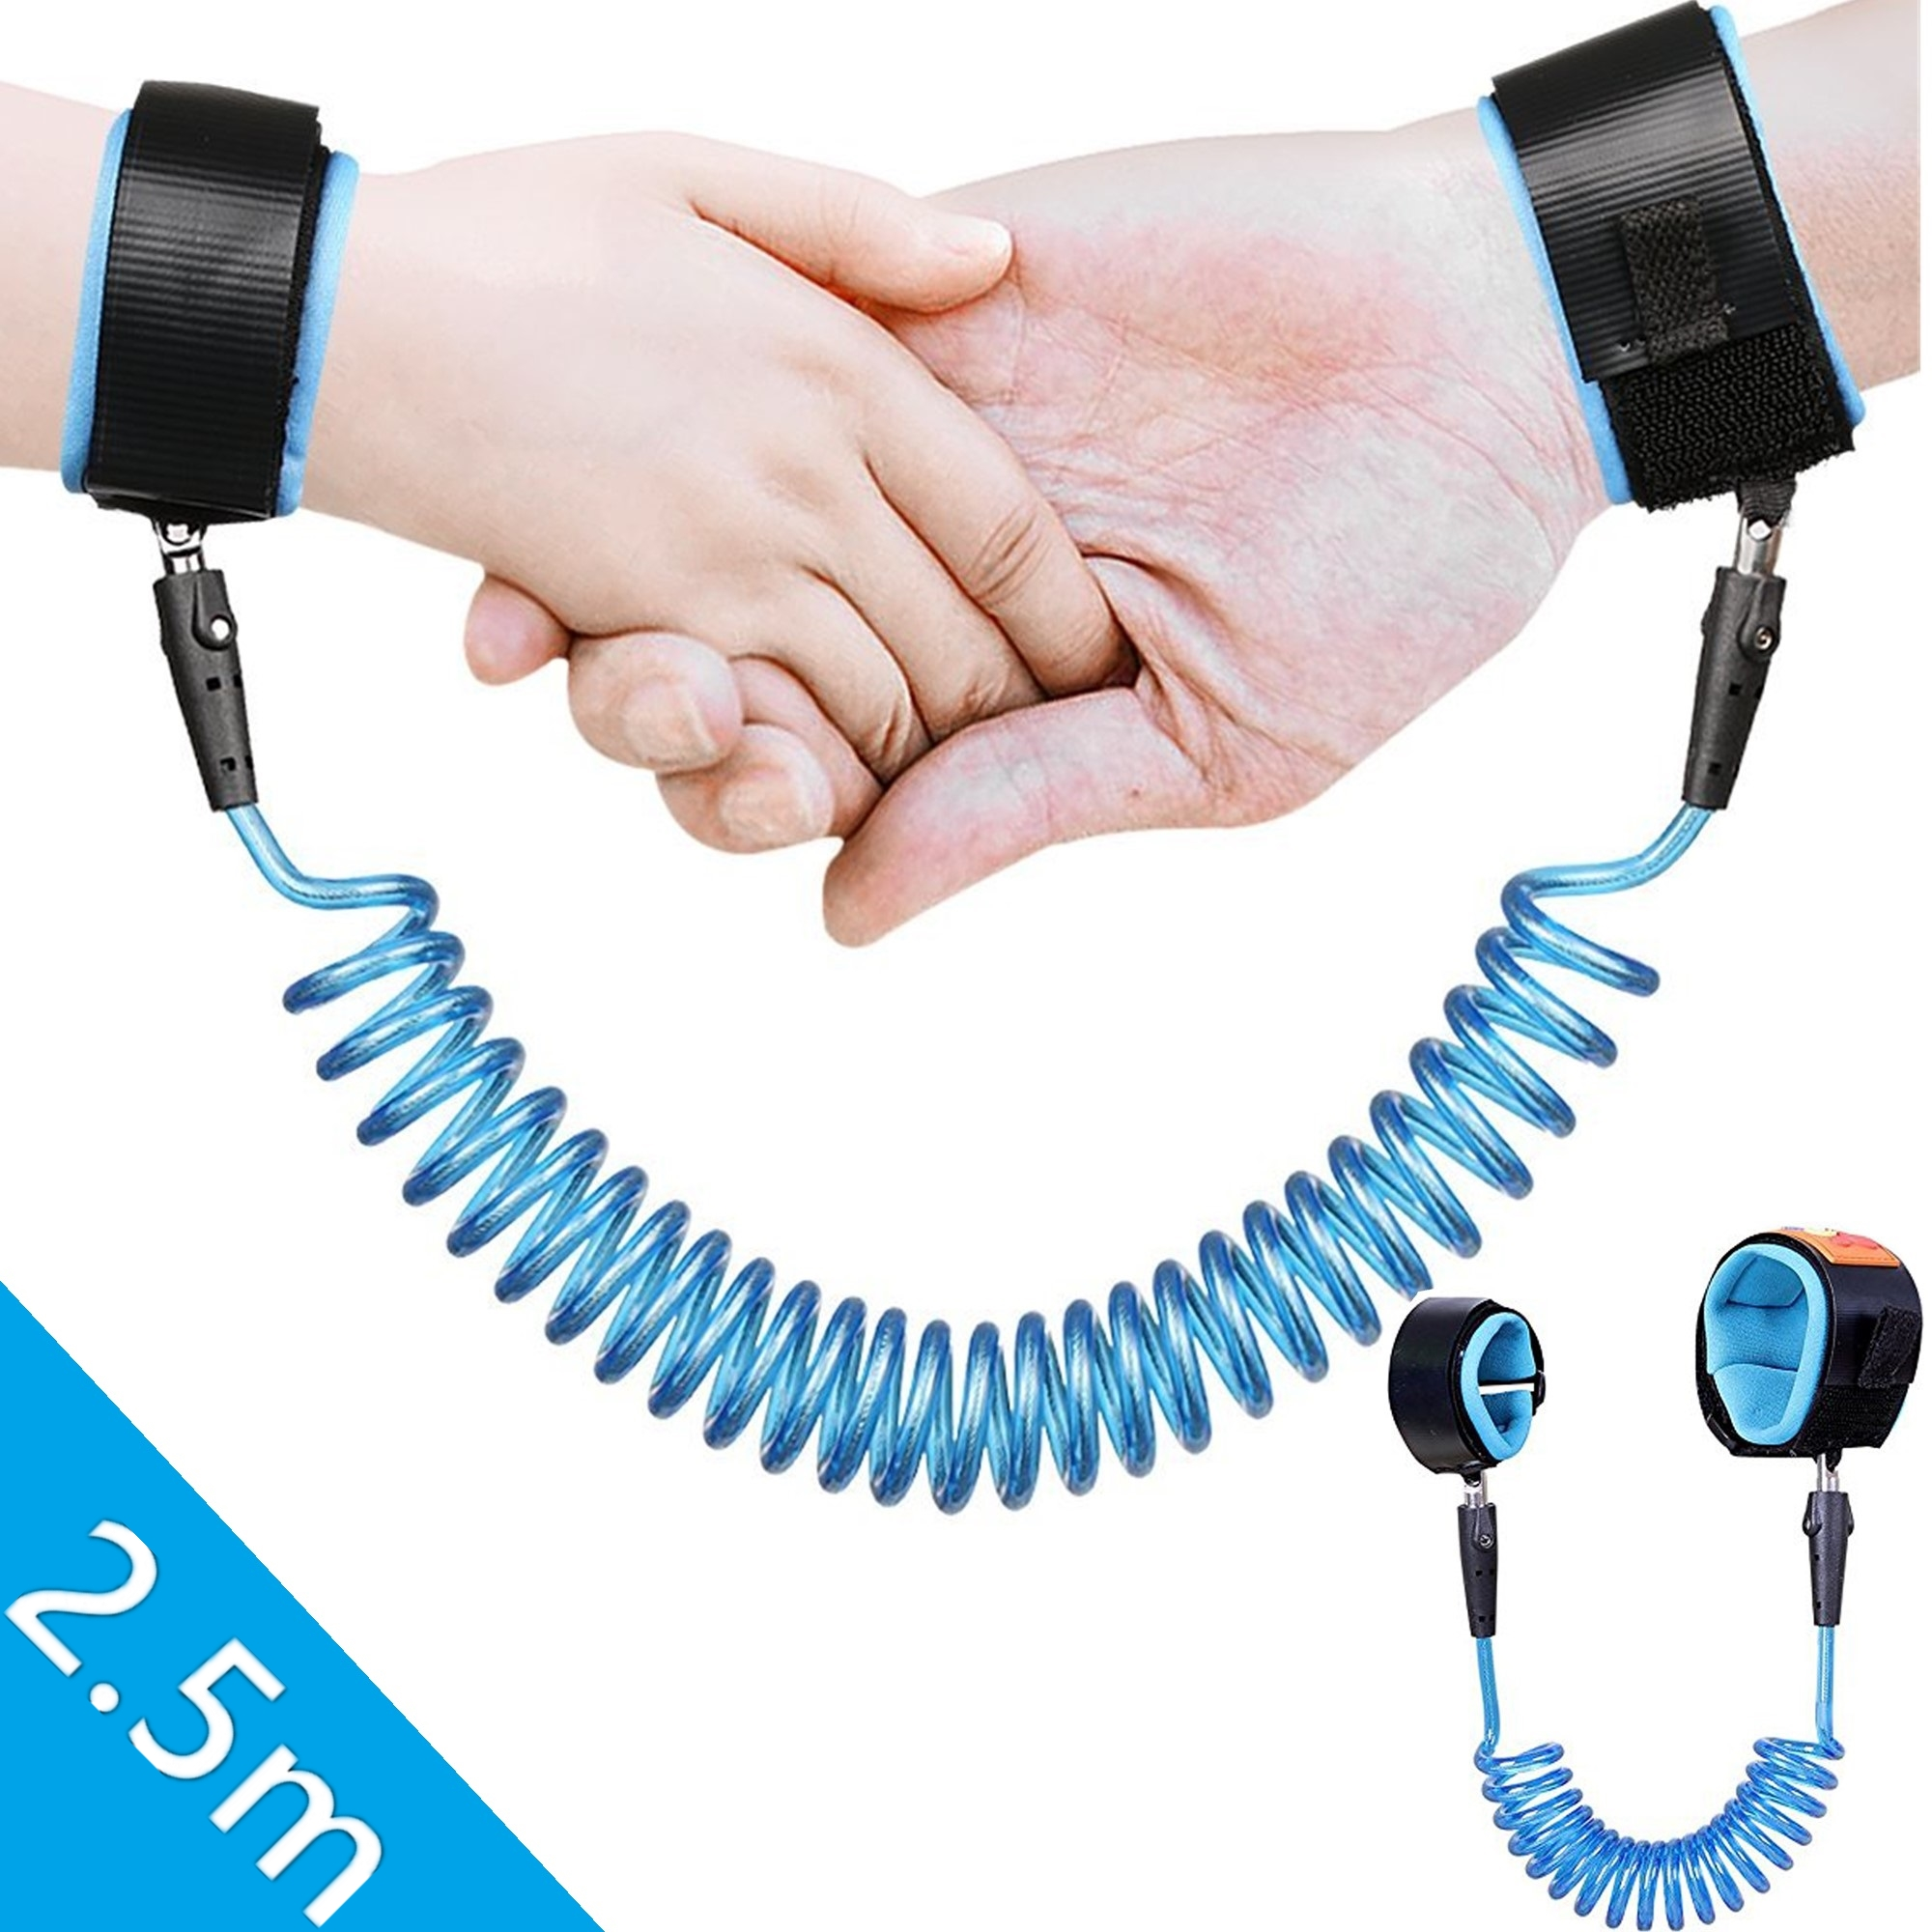 Anti Lost Wrist Link Belt, Child Traction Rope Belt, Toddlers Safety Harness Leash Kids Velcro Wrist Link, Walking Hand Belt ,Adjustable Skin Friendly Safety Wrist Belt(2.5M,Blue)